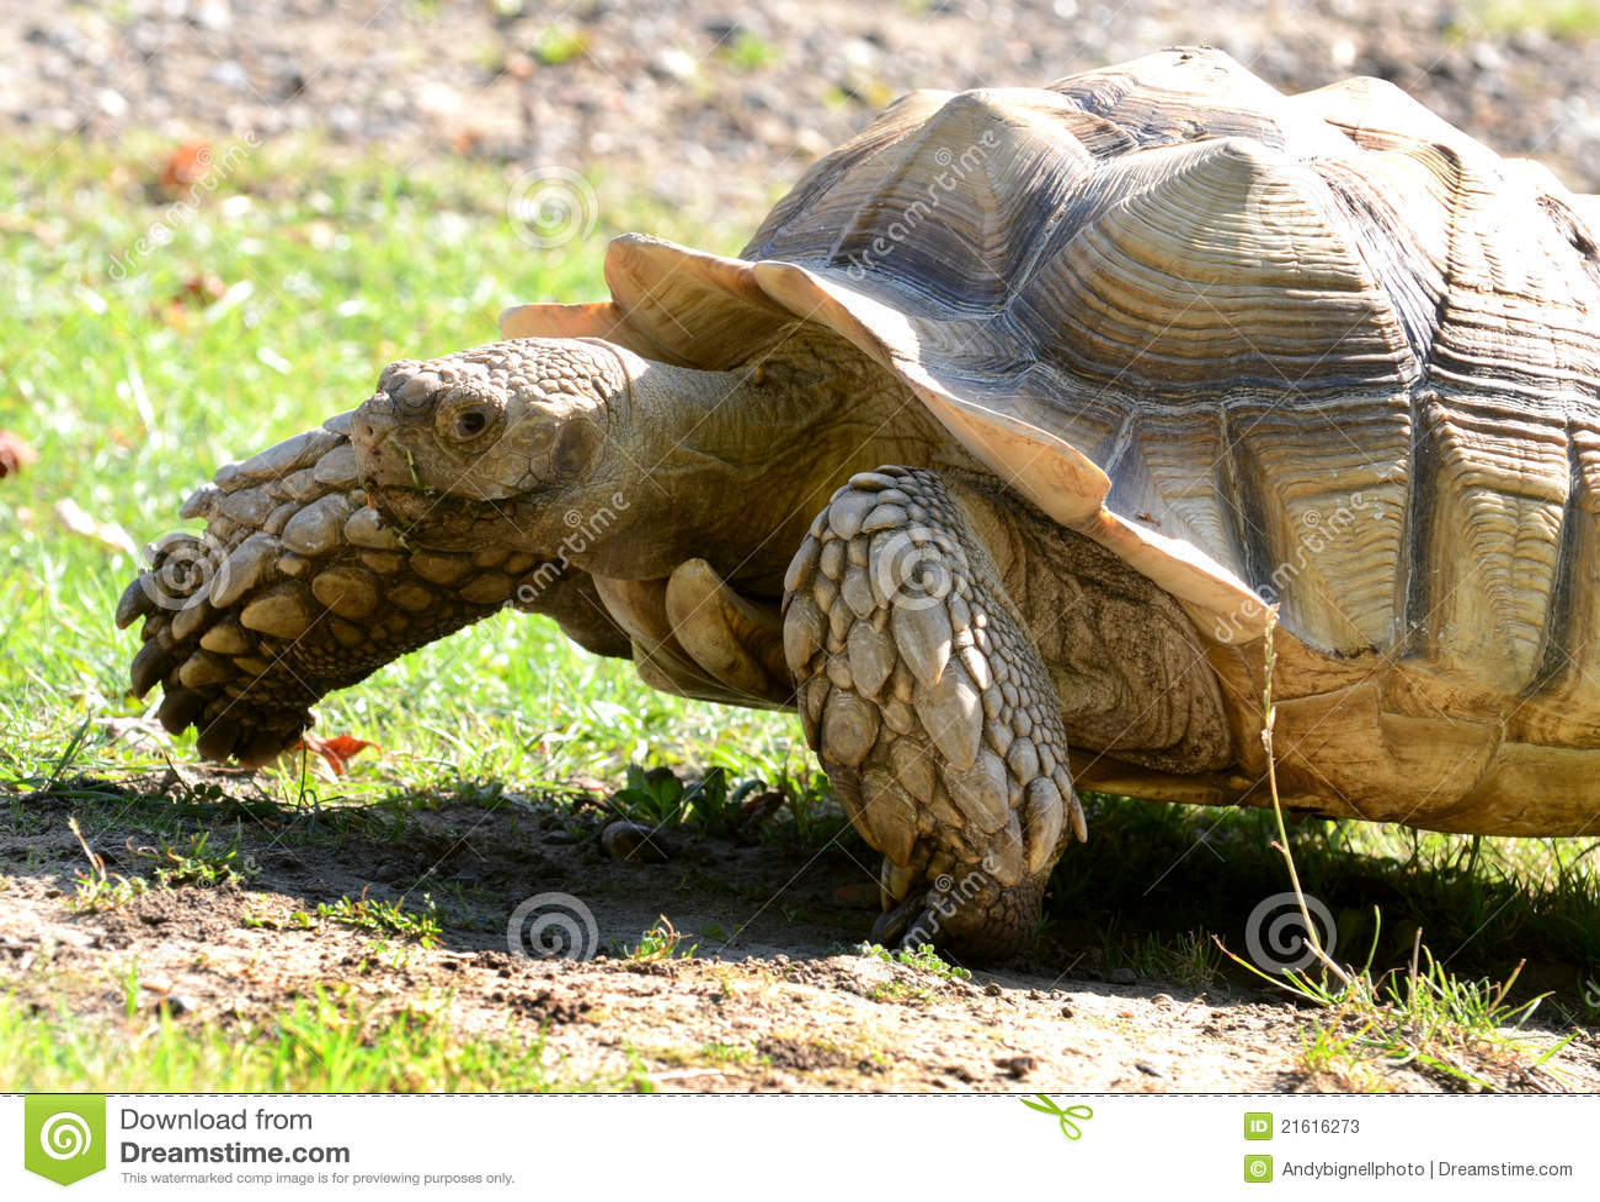 Thigh Tortoise Spur African